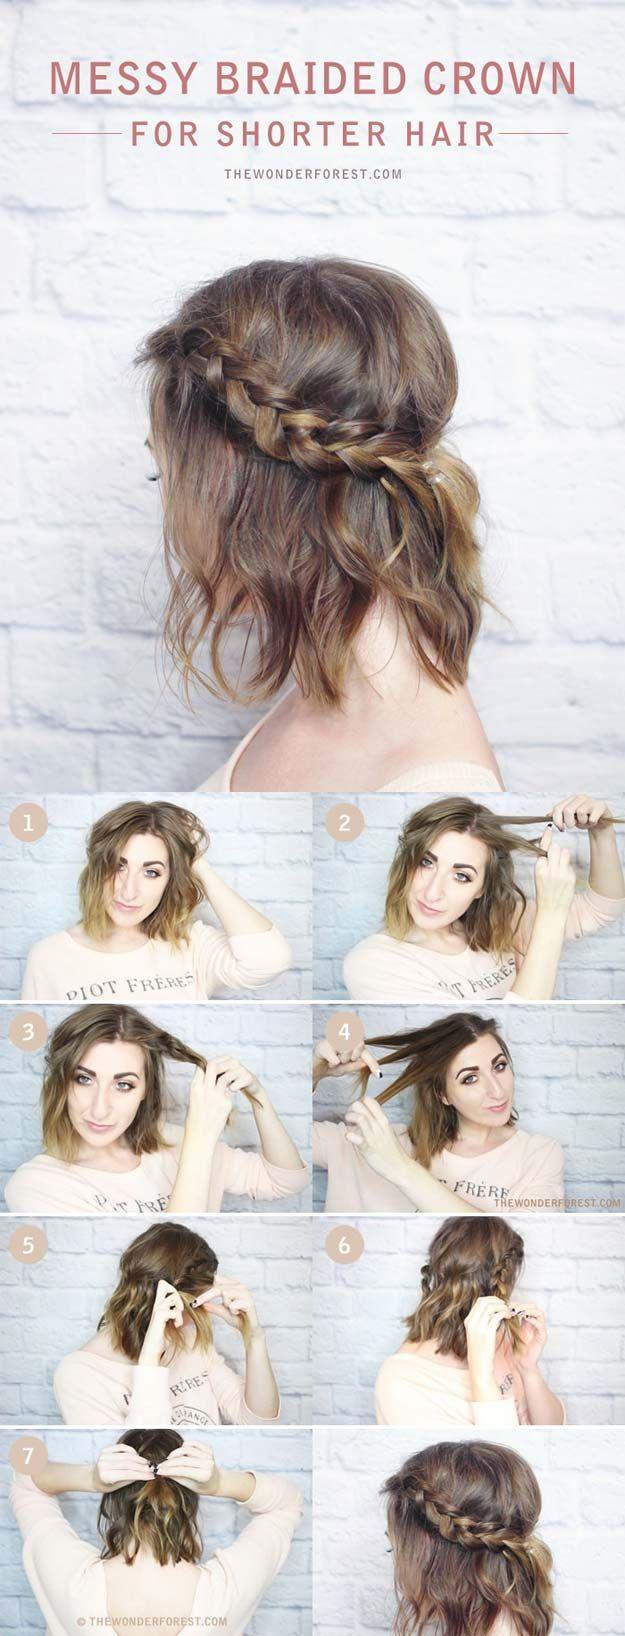 644 best Crown Braid Short Hair images on Pinterest ...